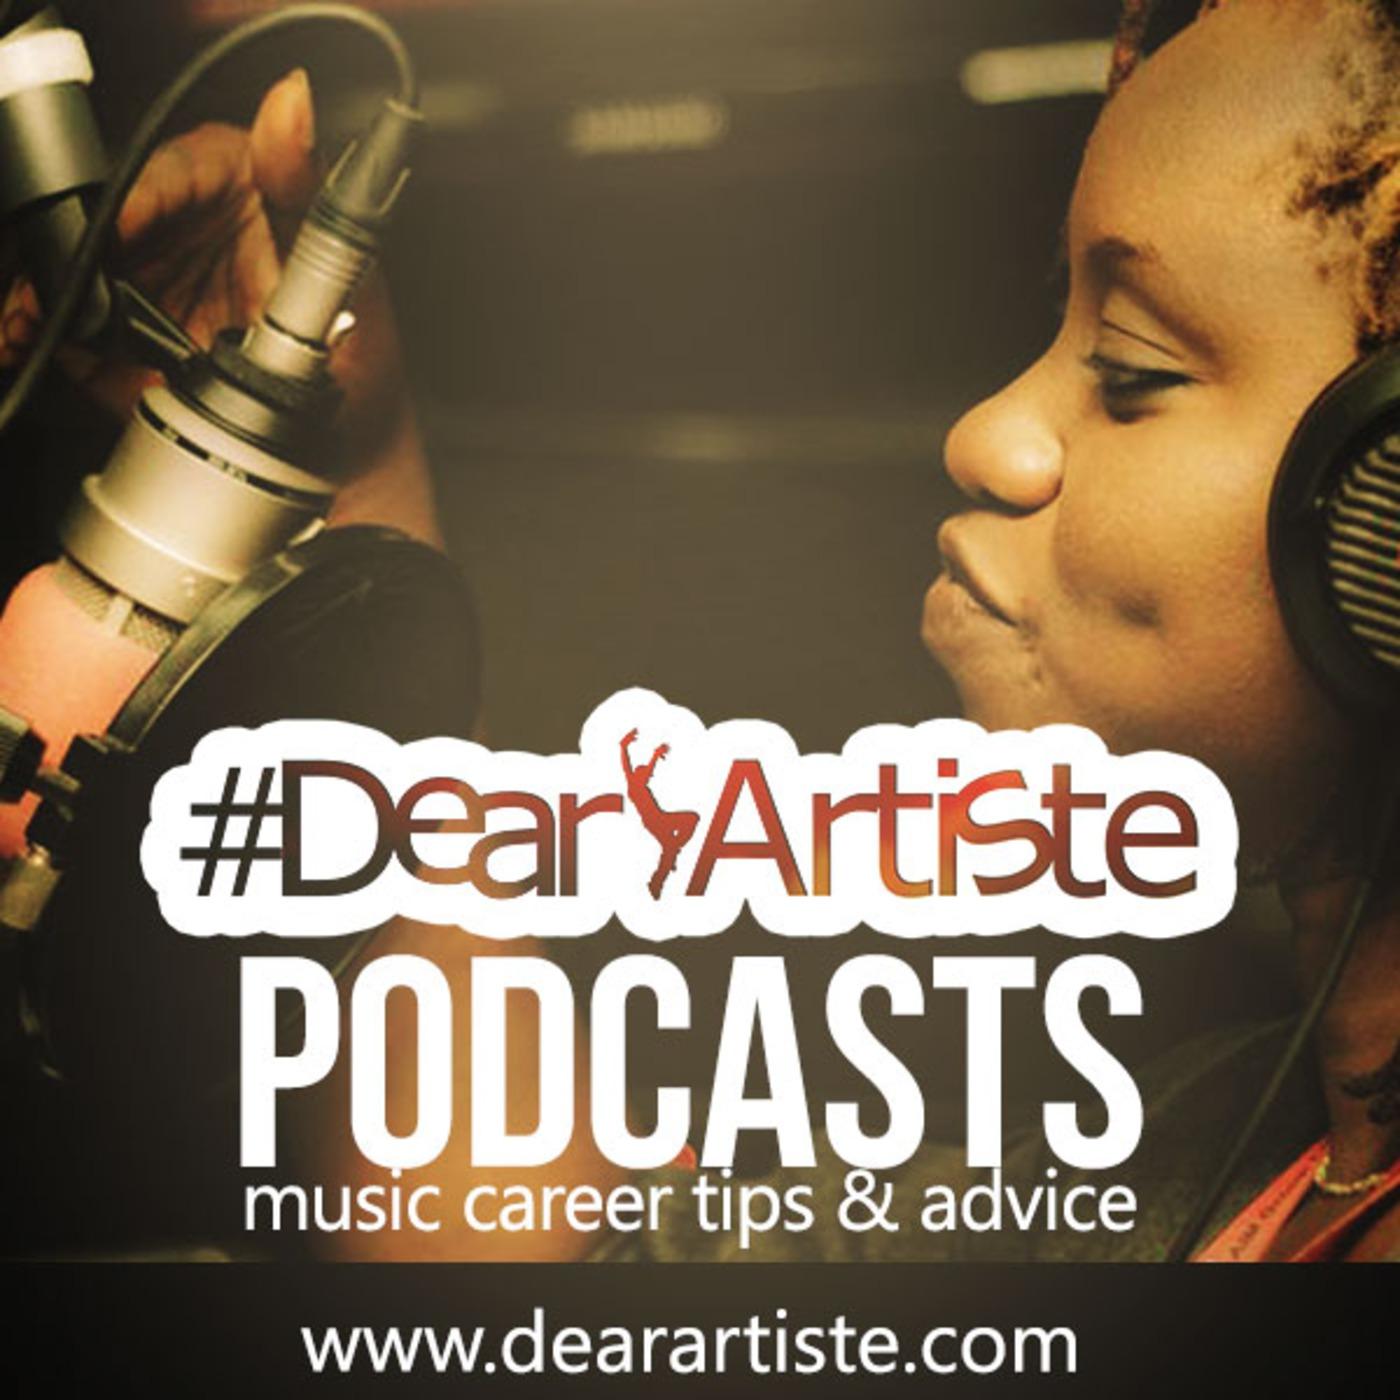 #DearArtiste's Podcast